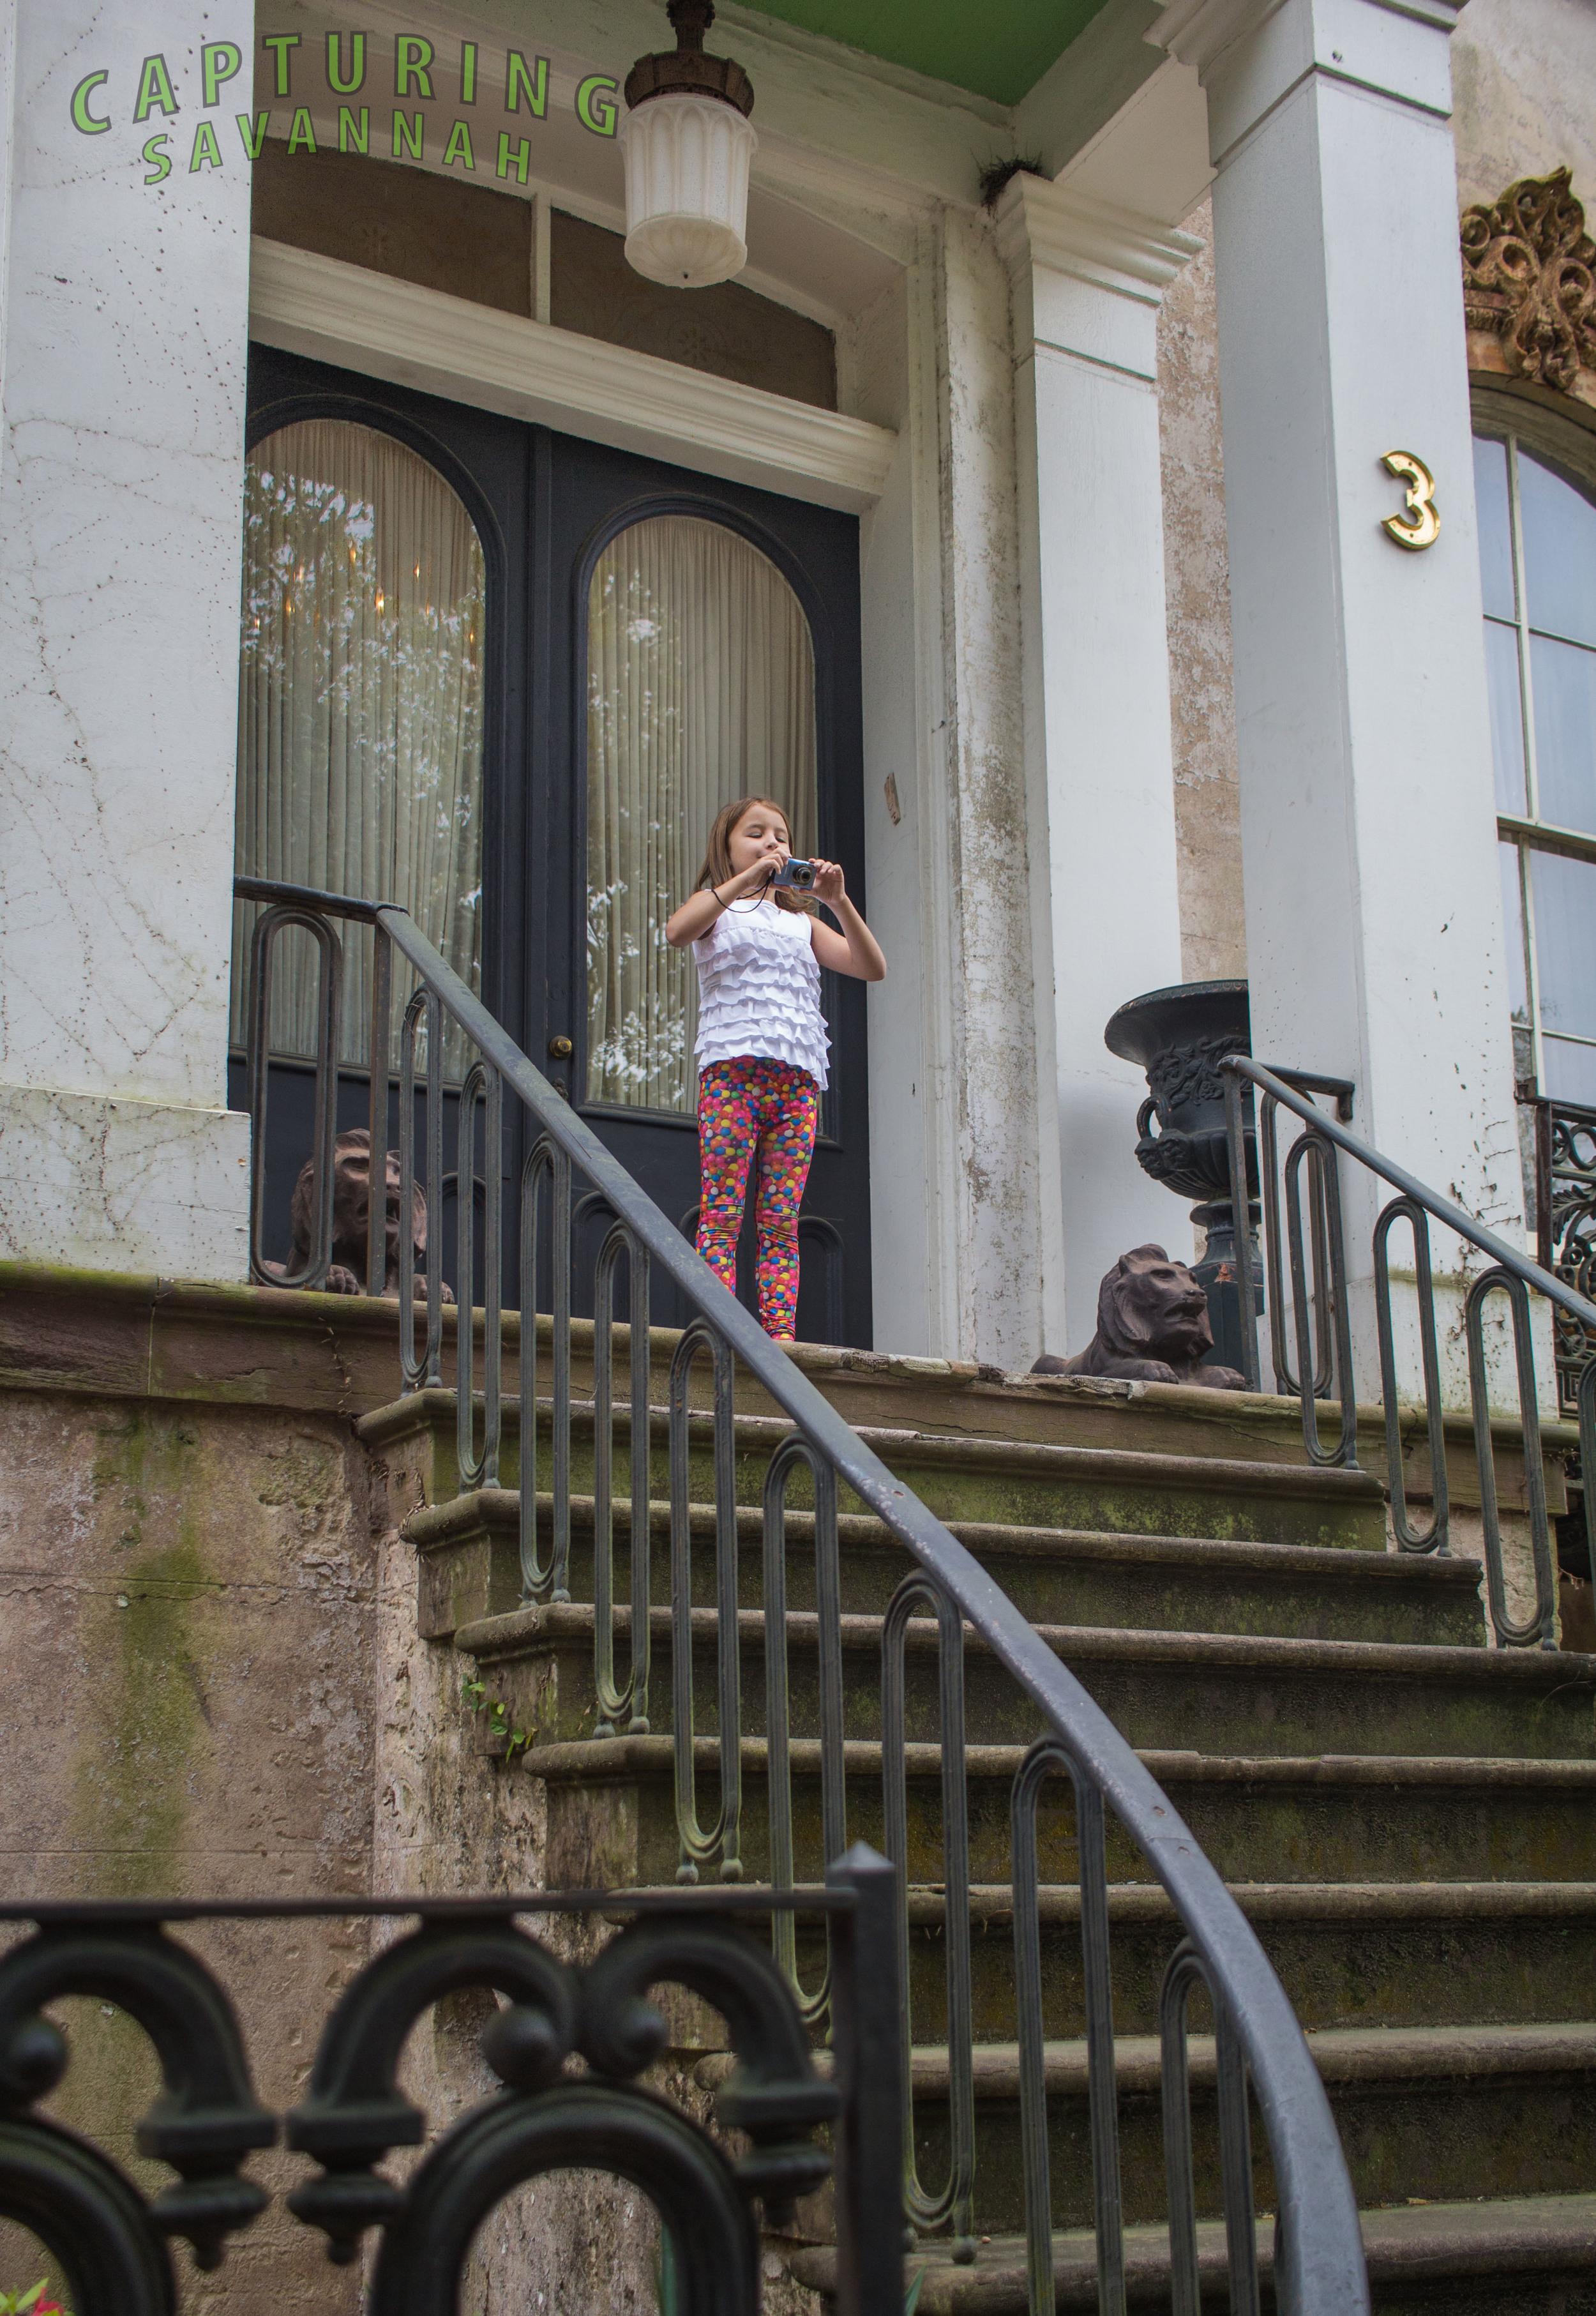 ©2015Capturing-Savannah_Photo-Tour_April-8_Spring_Guests3.jpg